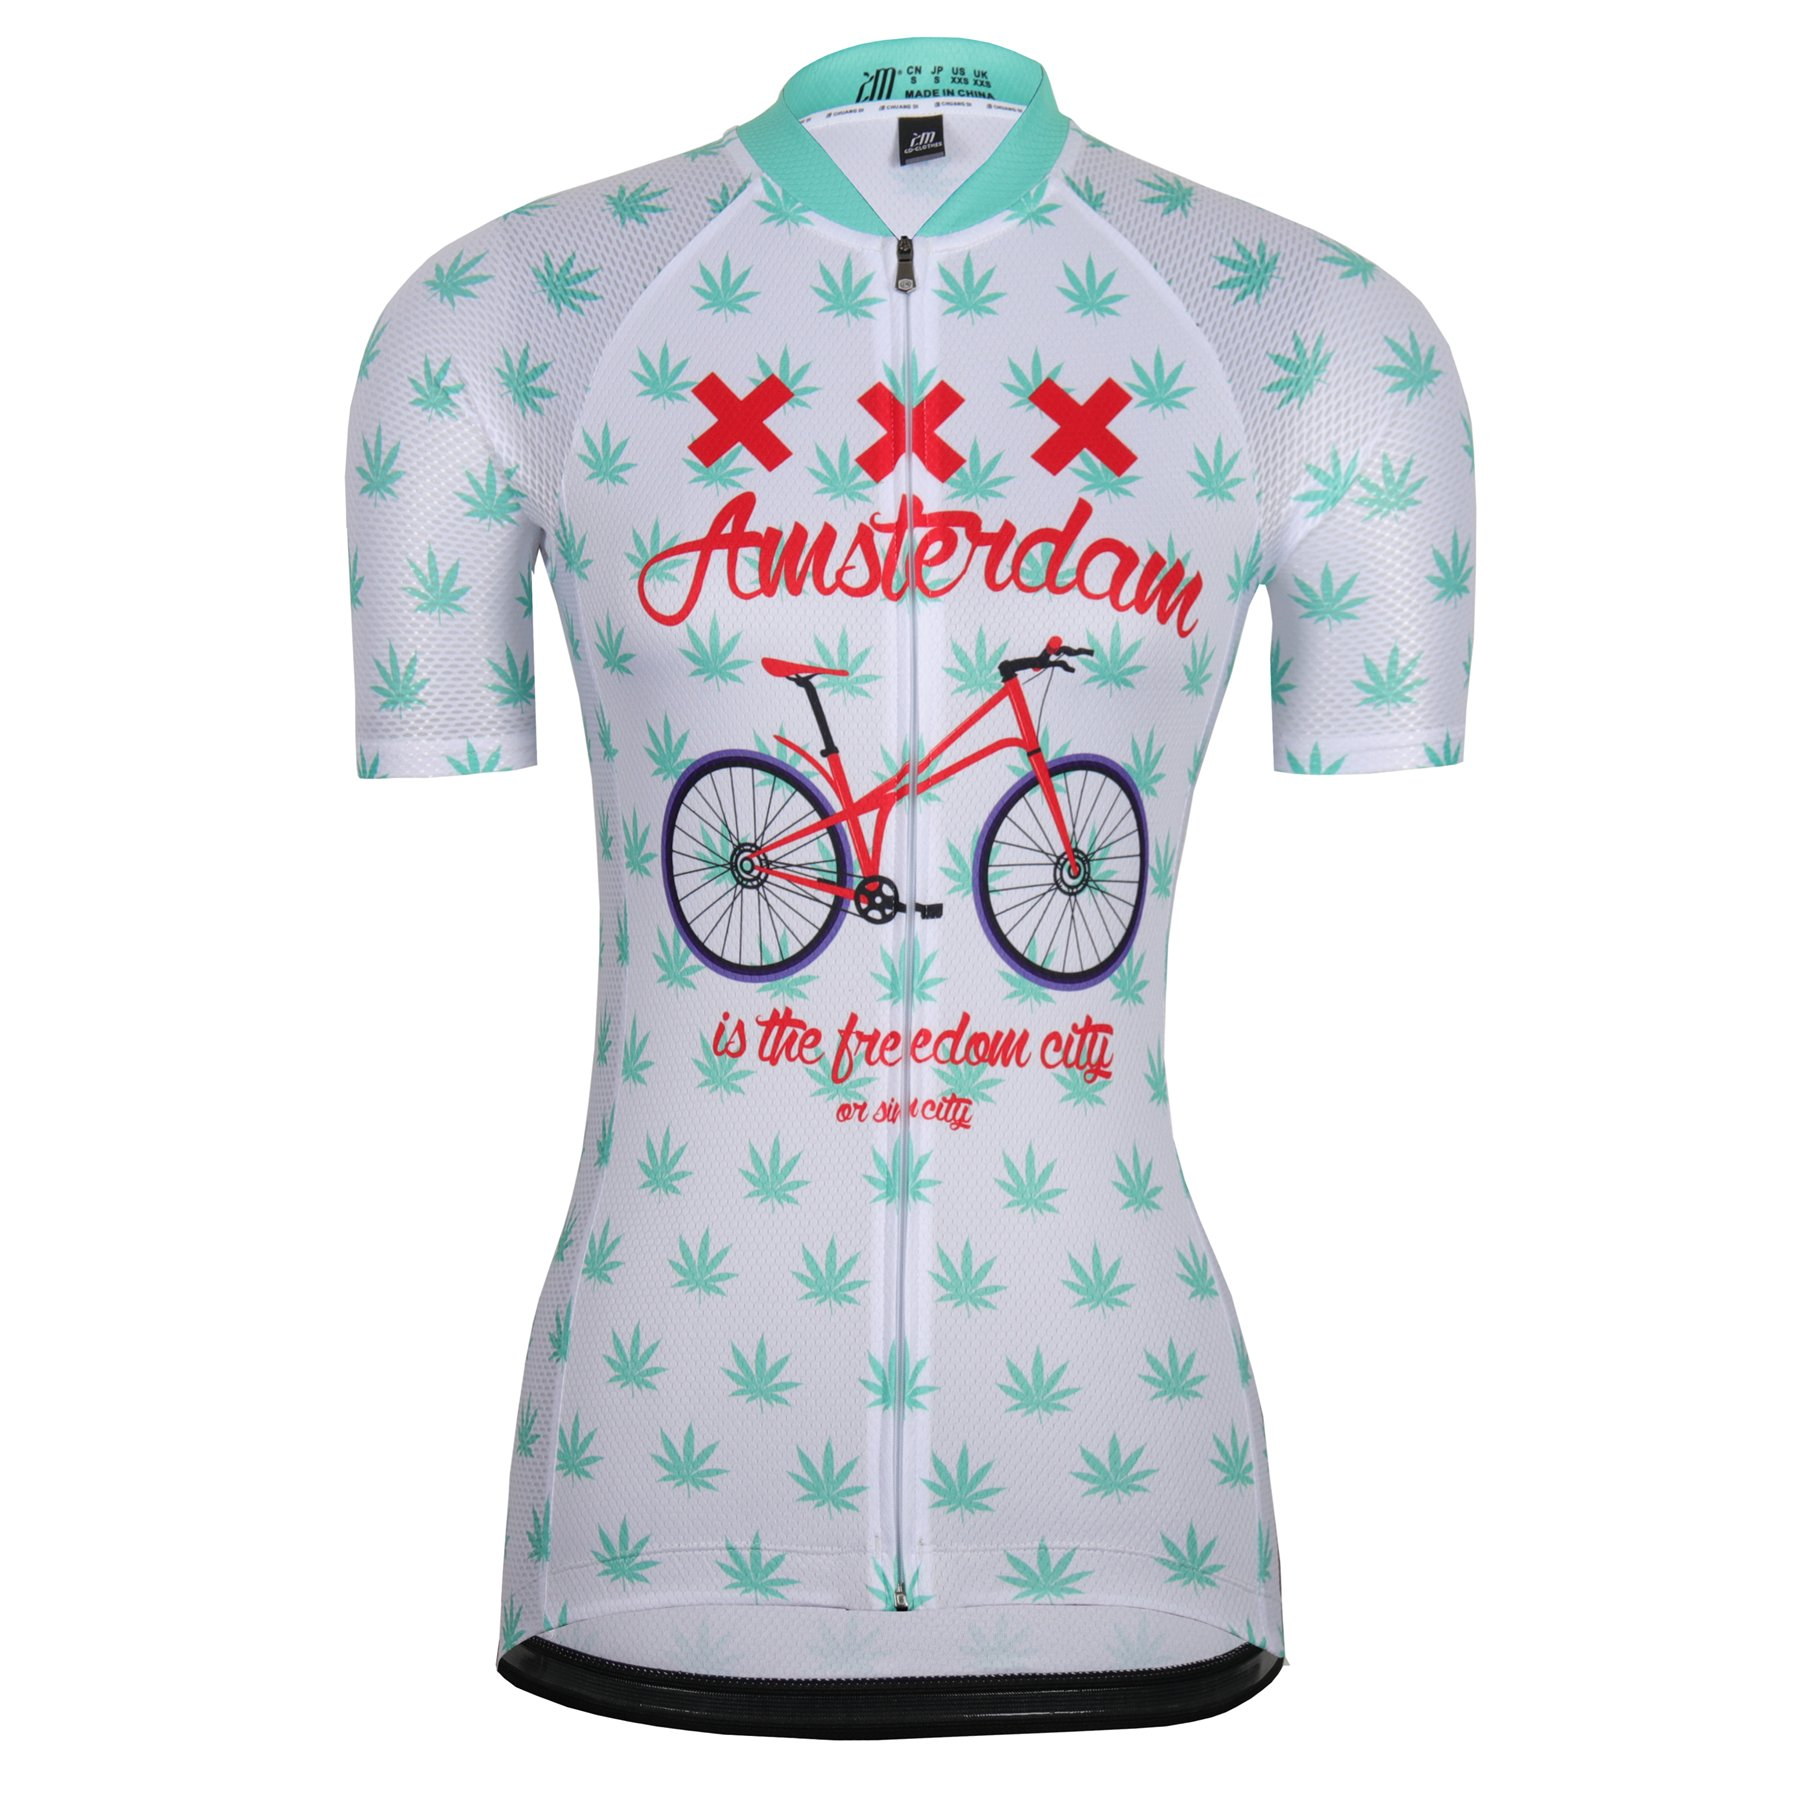 Women's Cycling Jersey Beautiful Bike Bicycle Clothing Shirt Jacket Summer (Asia-S, 29) by ZM